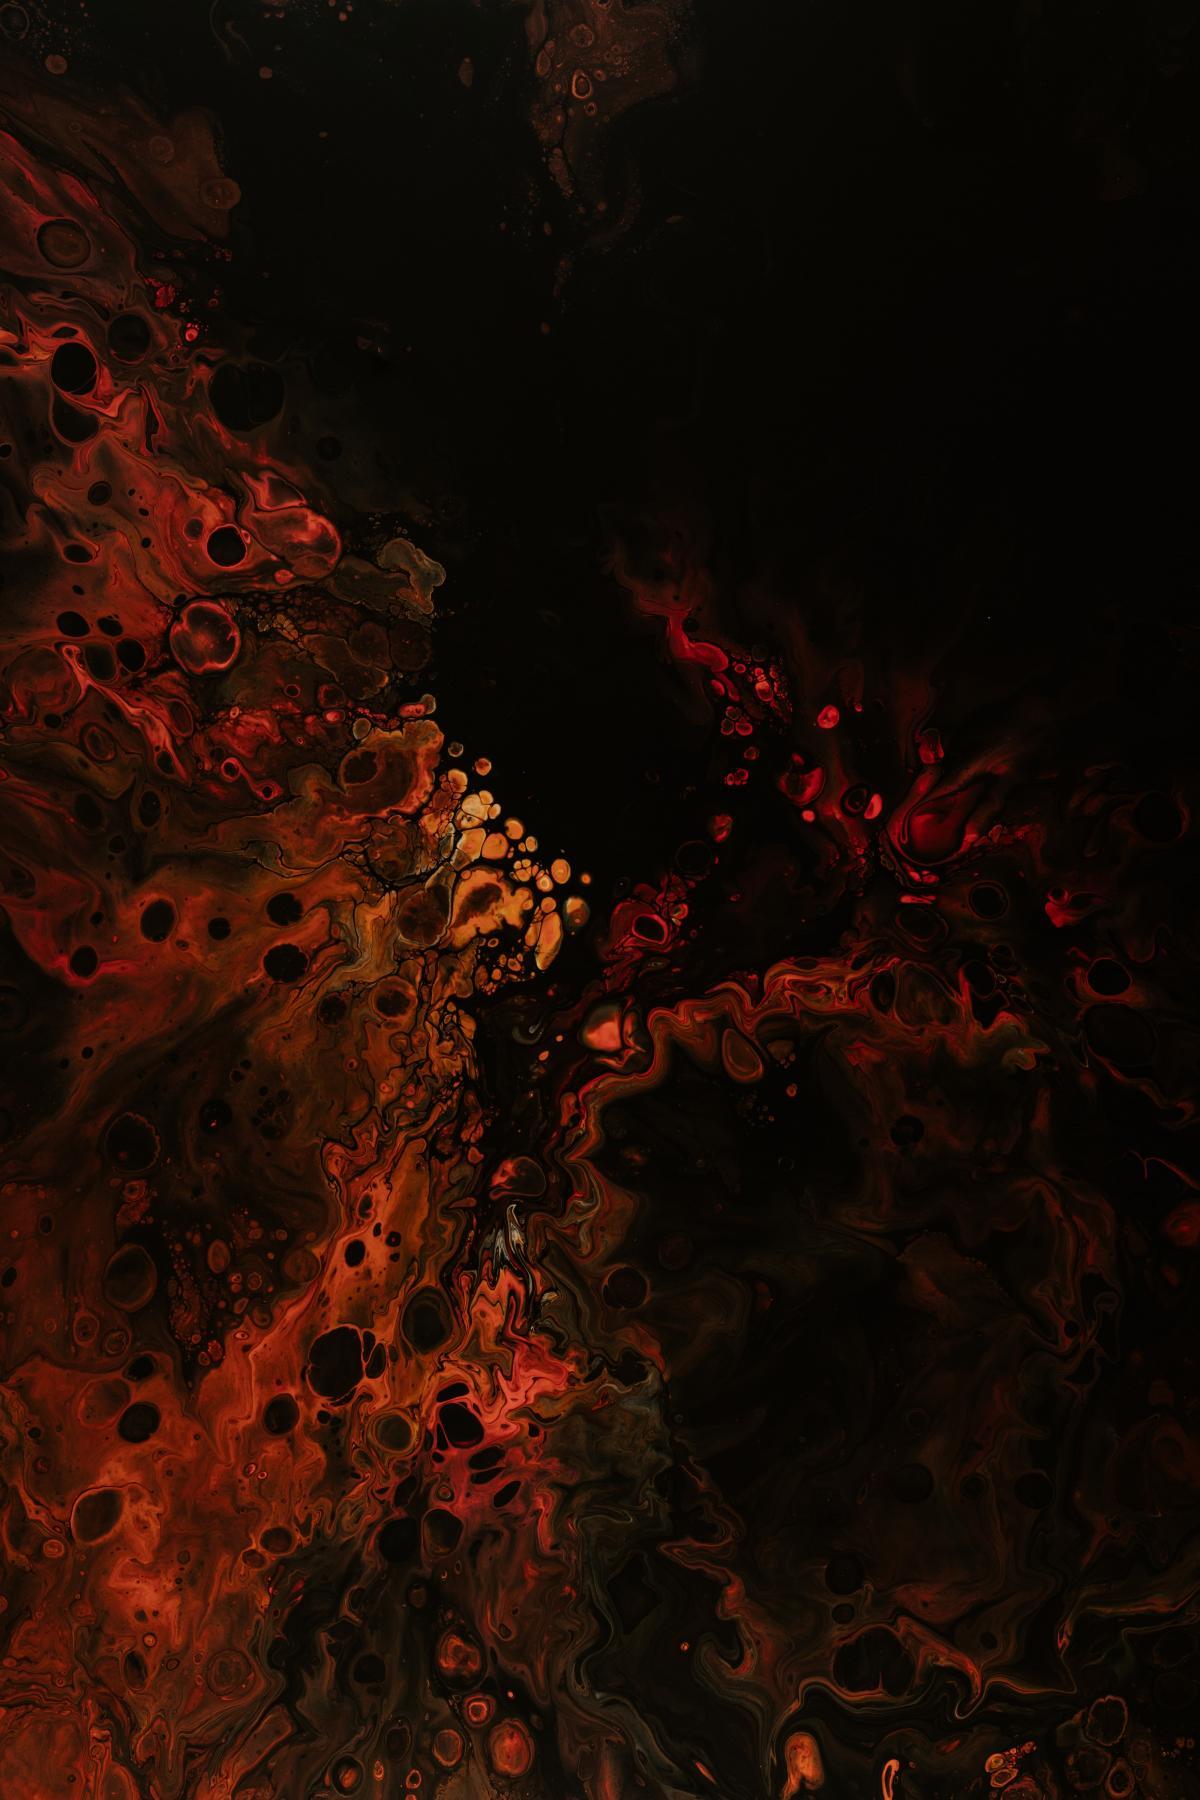 Fireplace Blaze Flame